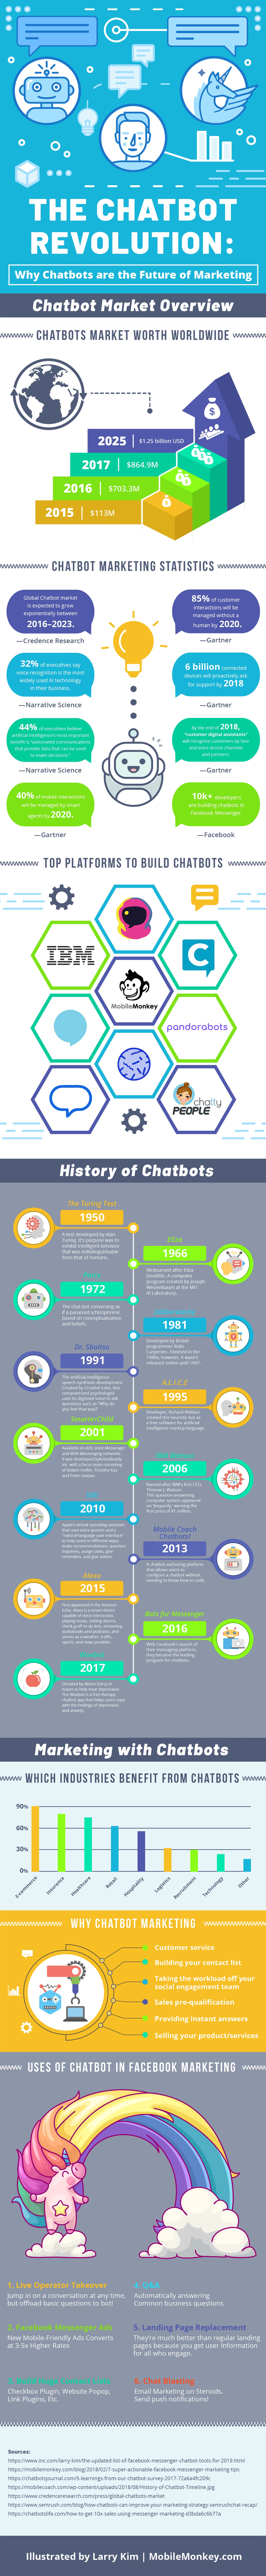 Chatbot Future info